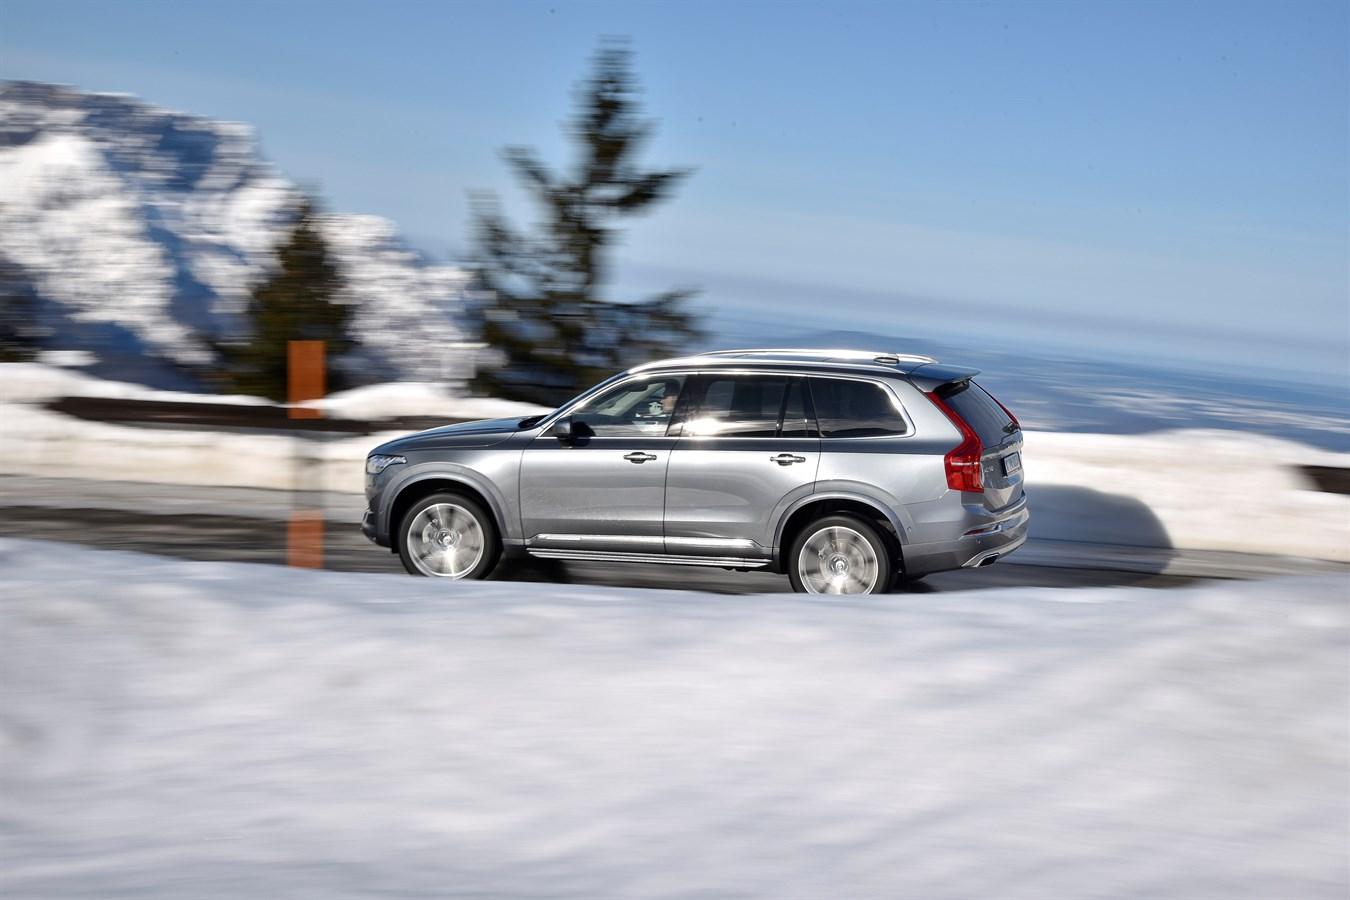 volvo xc90 t5 inscription awd model year 2017 volvo car group global media newsroom. Black Bedroom Furniture Sets. Home Design Ideas